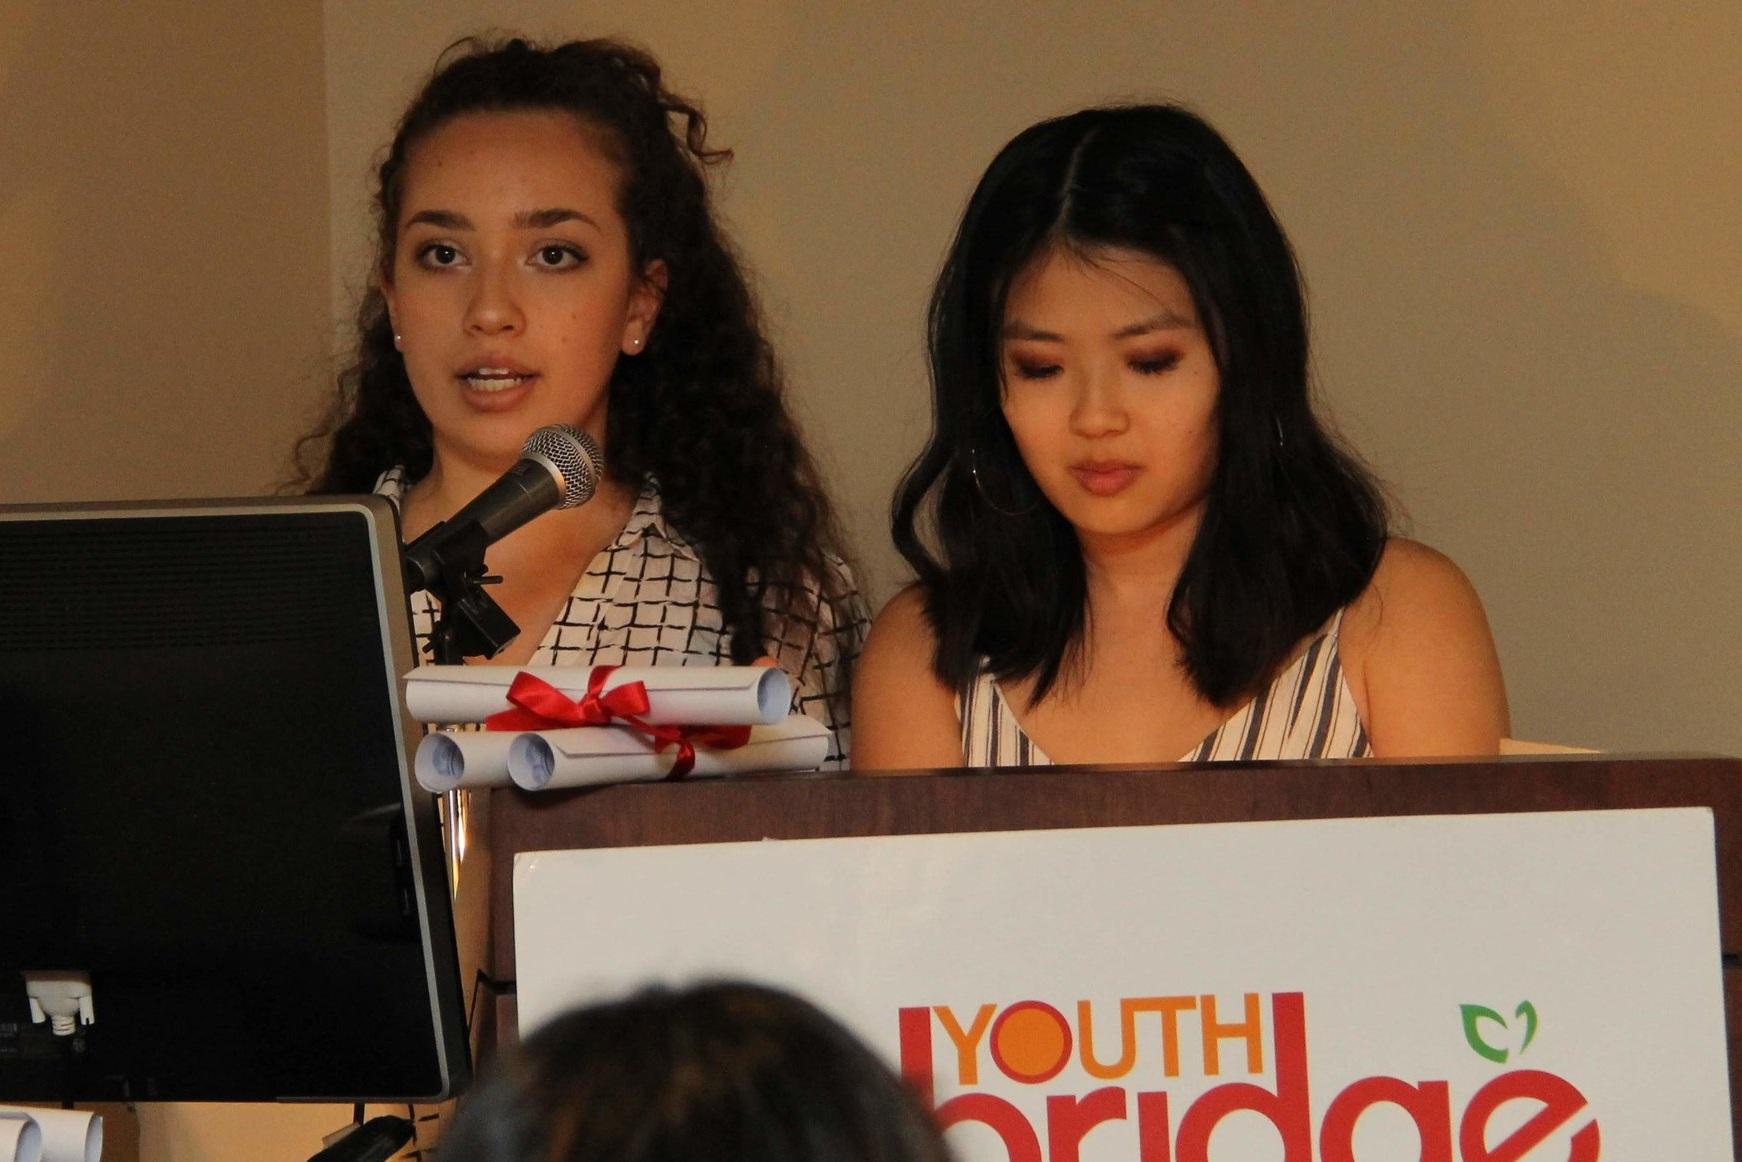 Jessica Gruboy and Chelsea Cheung are both graduating seniors at Stuyvesant High School.